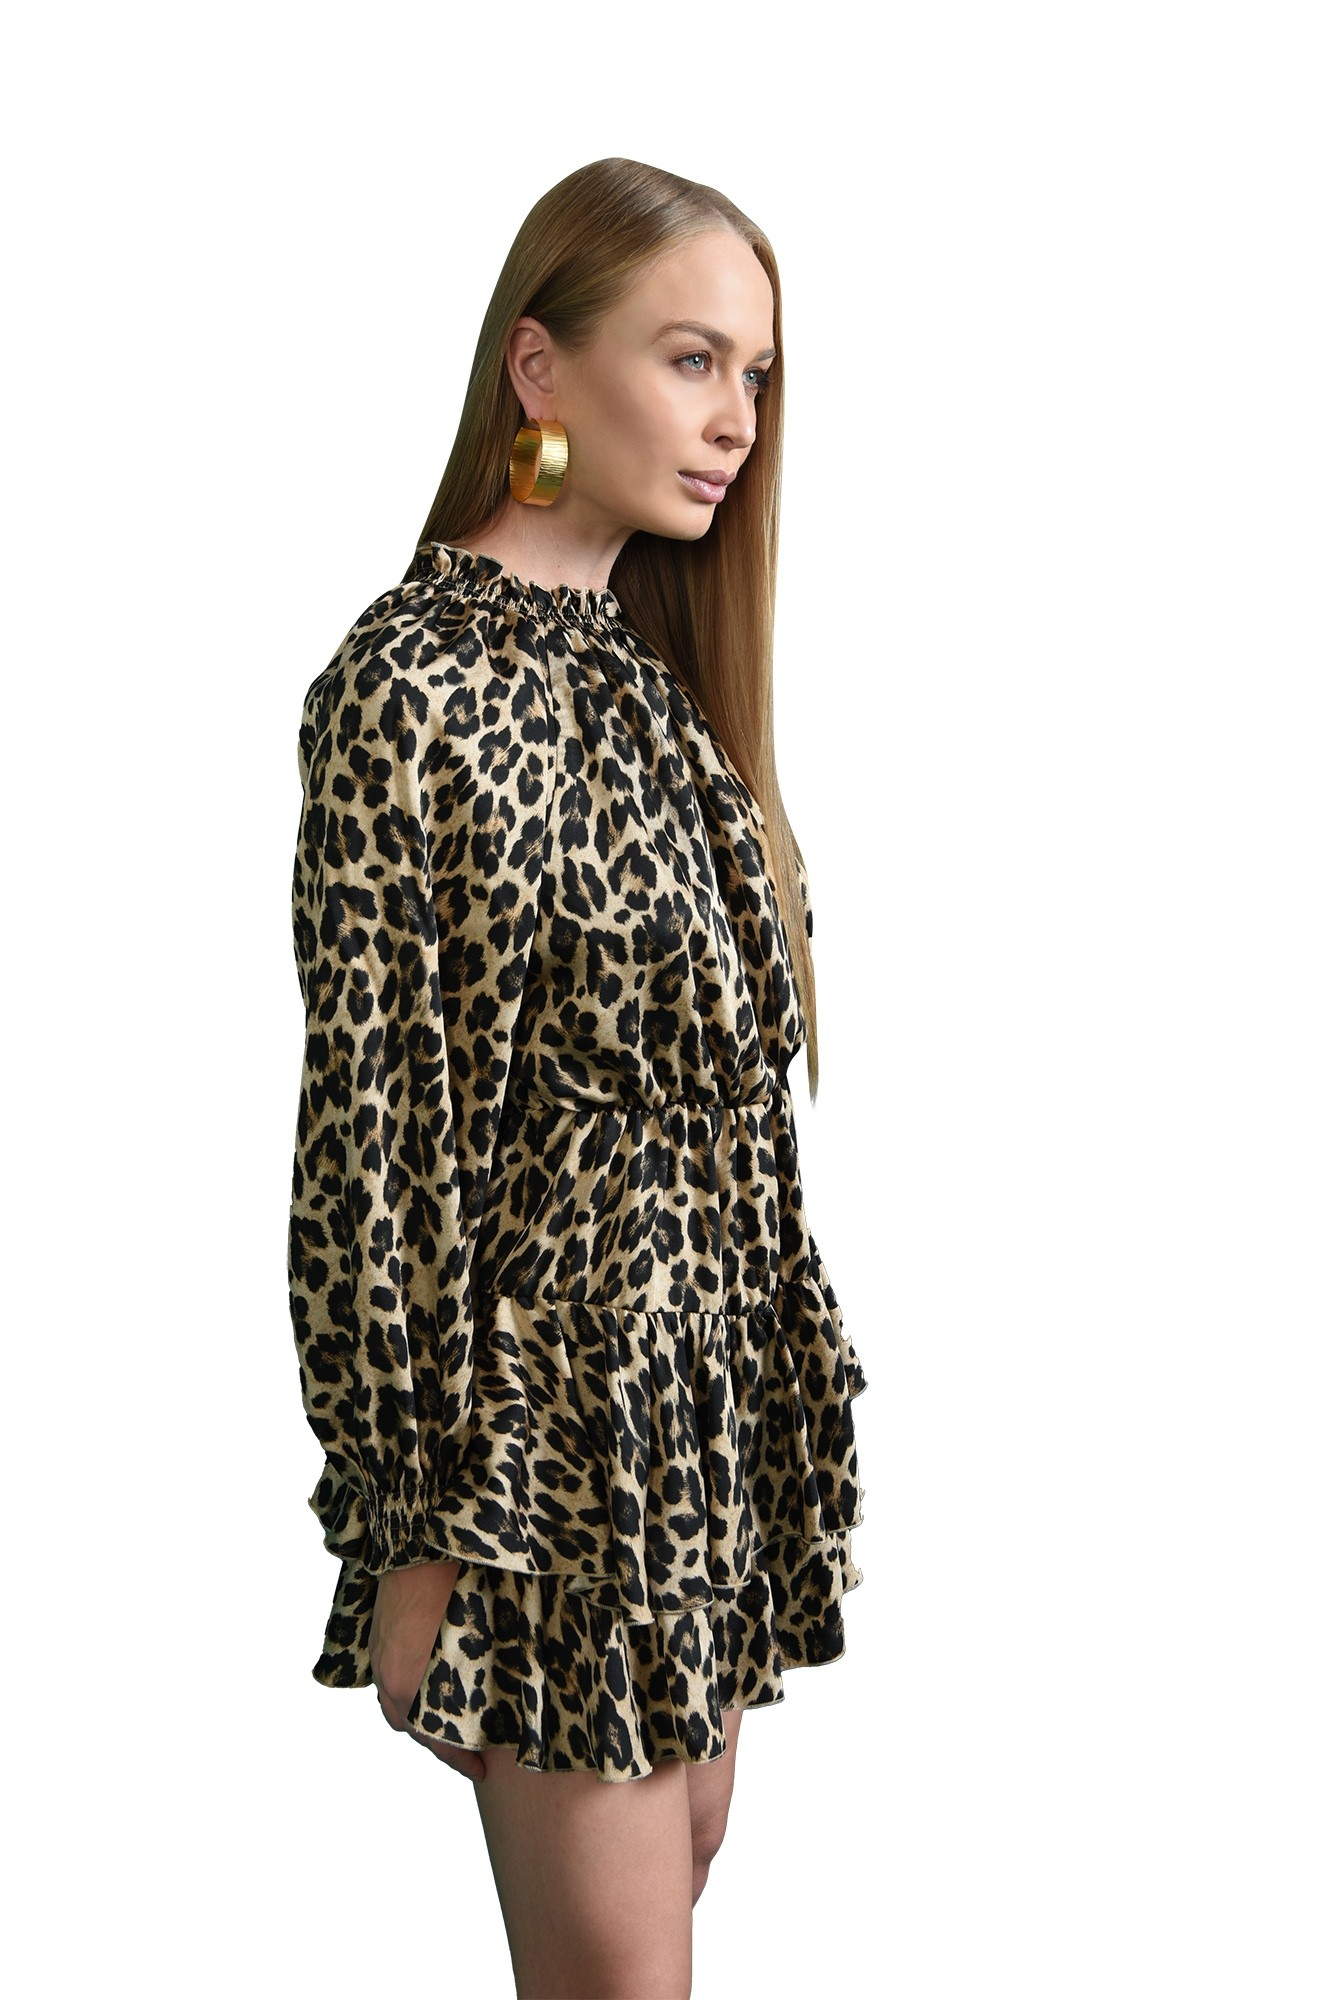 3 - rochie animal print, cu maneca lunga, Poema